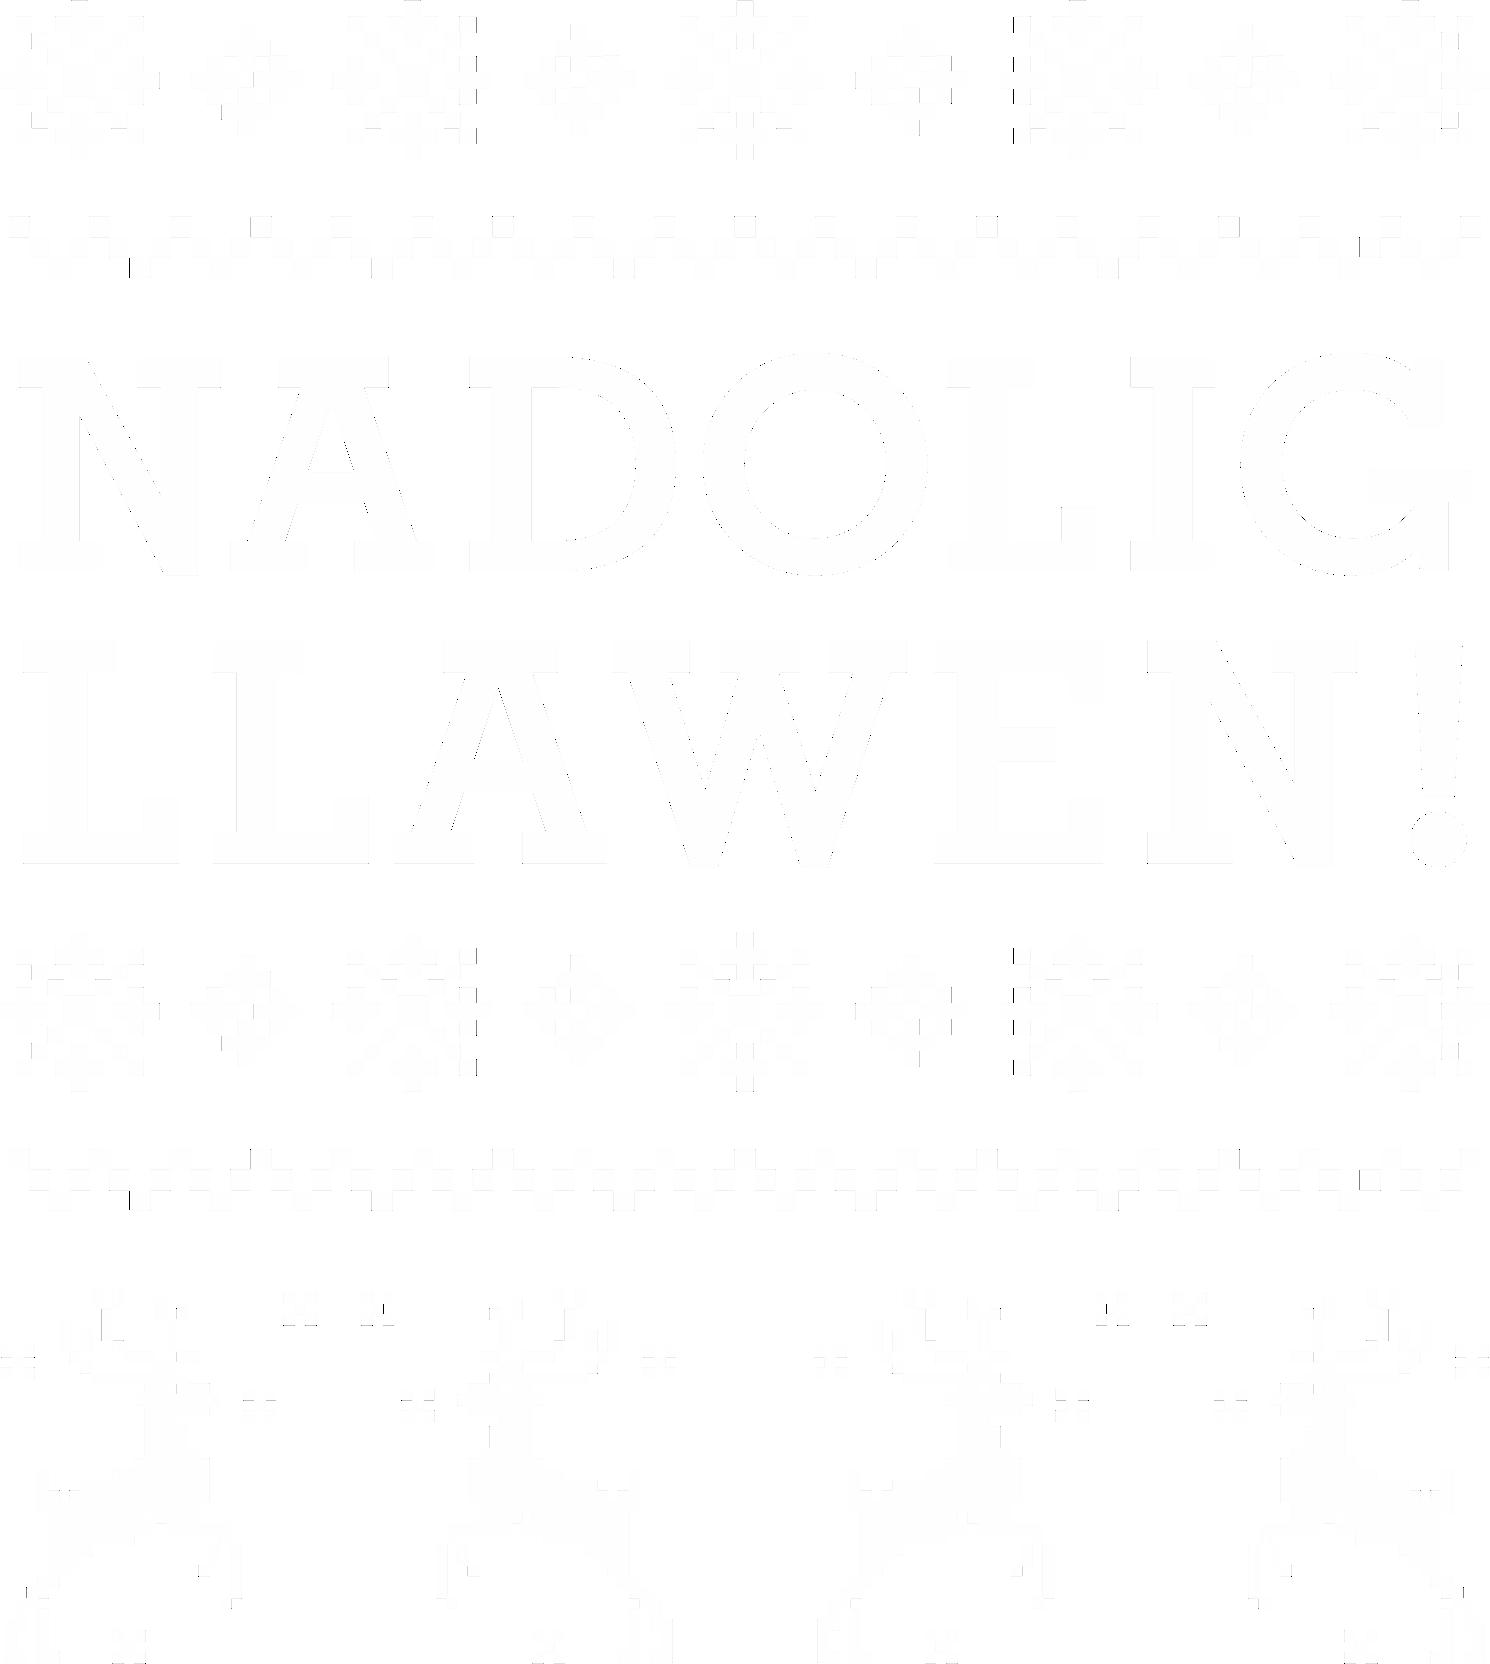 Christmas T-shirt design